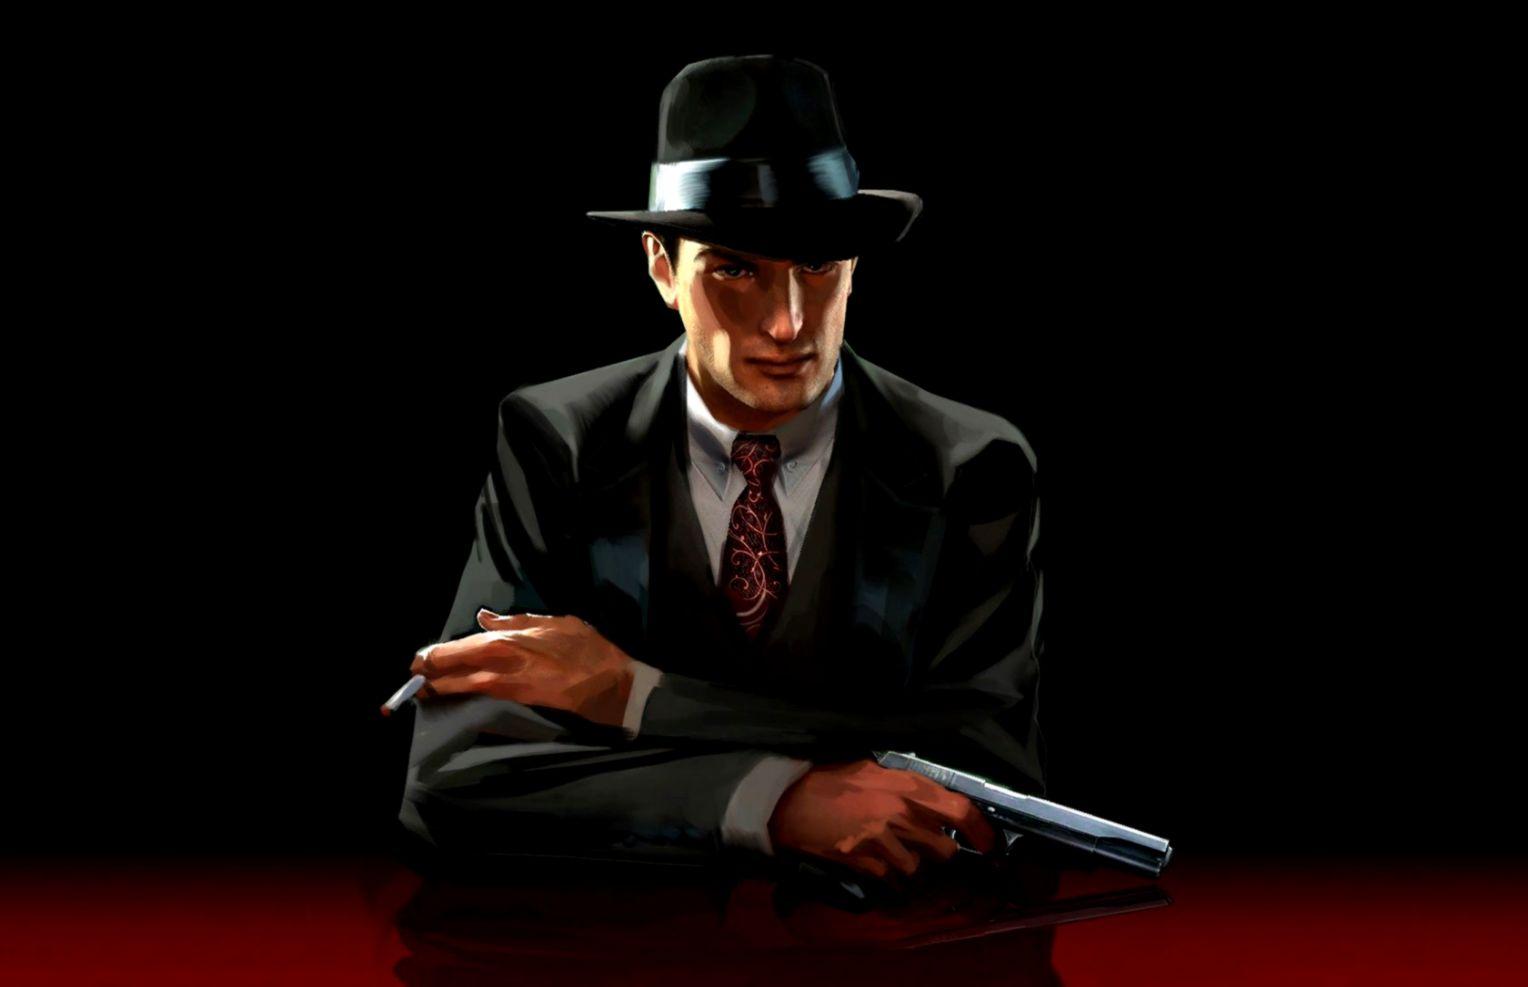 Mafia 2 Game Wallpapers Hd Wallpapers Magazine